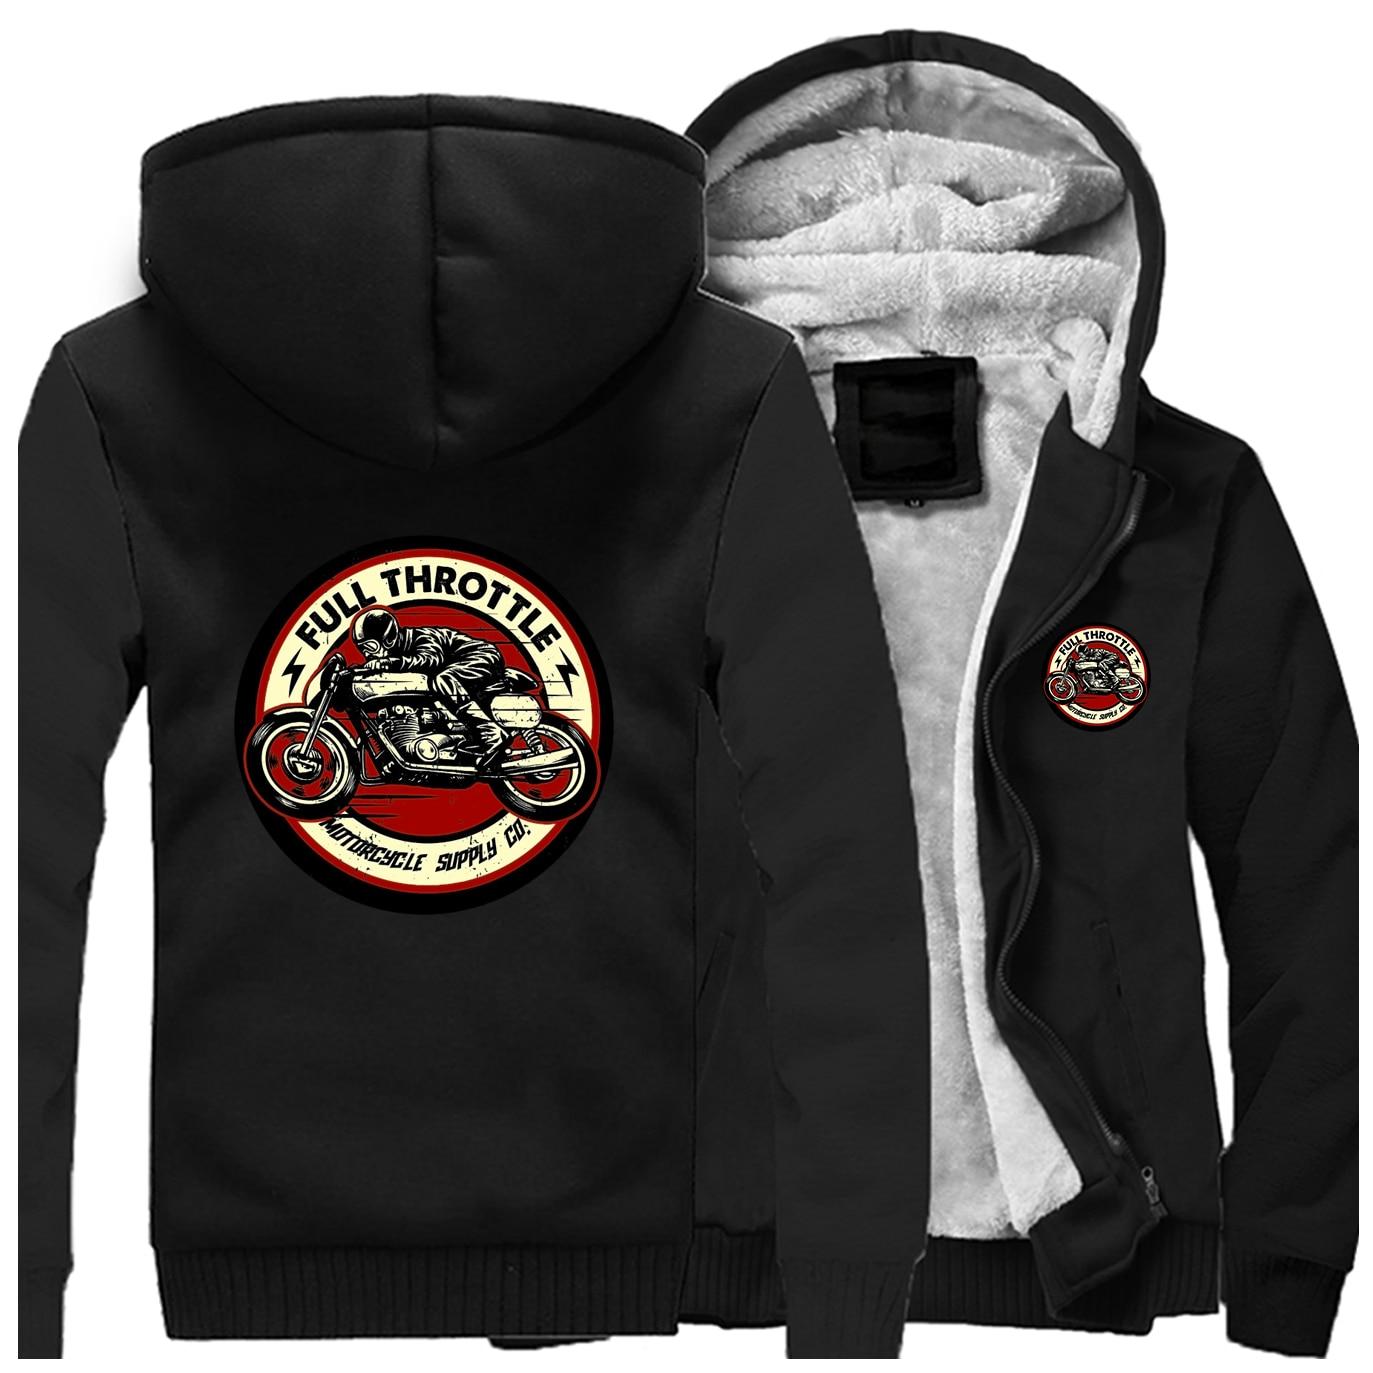 2019 Winter Men Thick Sweatshirt Full Throttle Cafe Racer Rockabilly Biker Zipper Jacket Fleece Warm Mens Thicken Hoodies